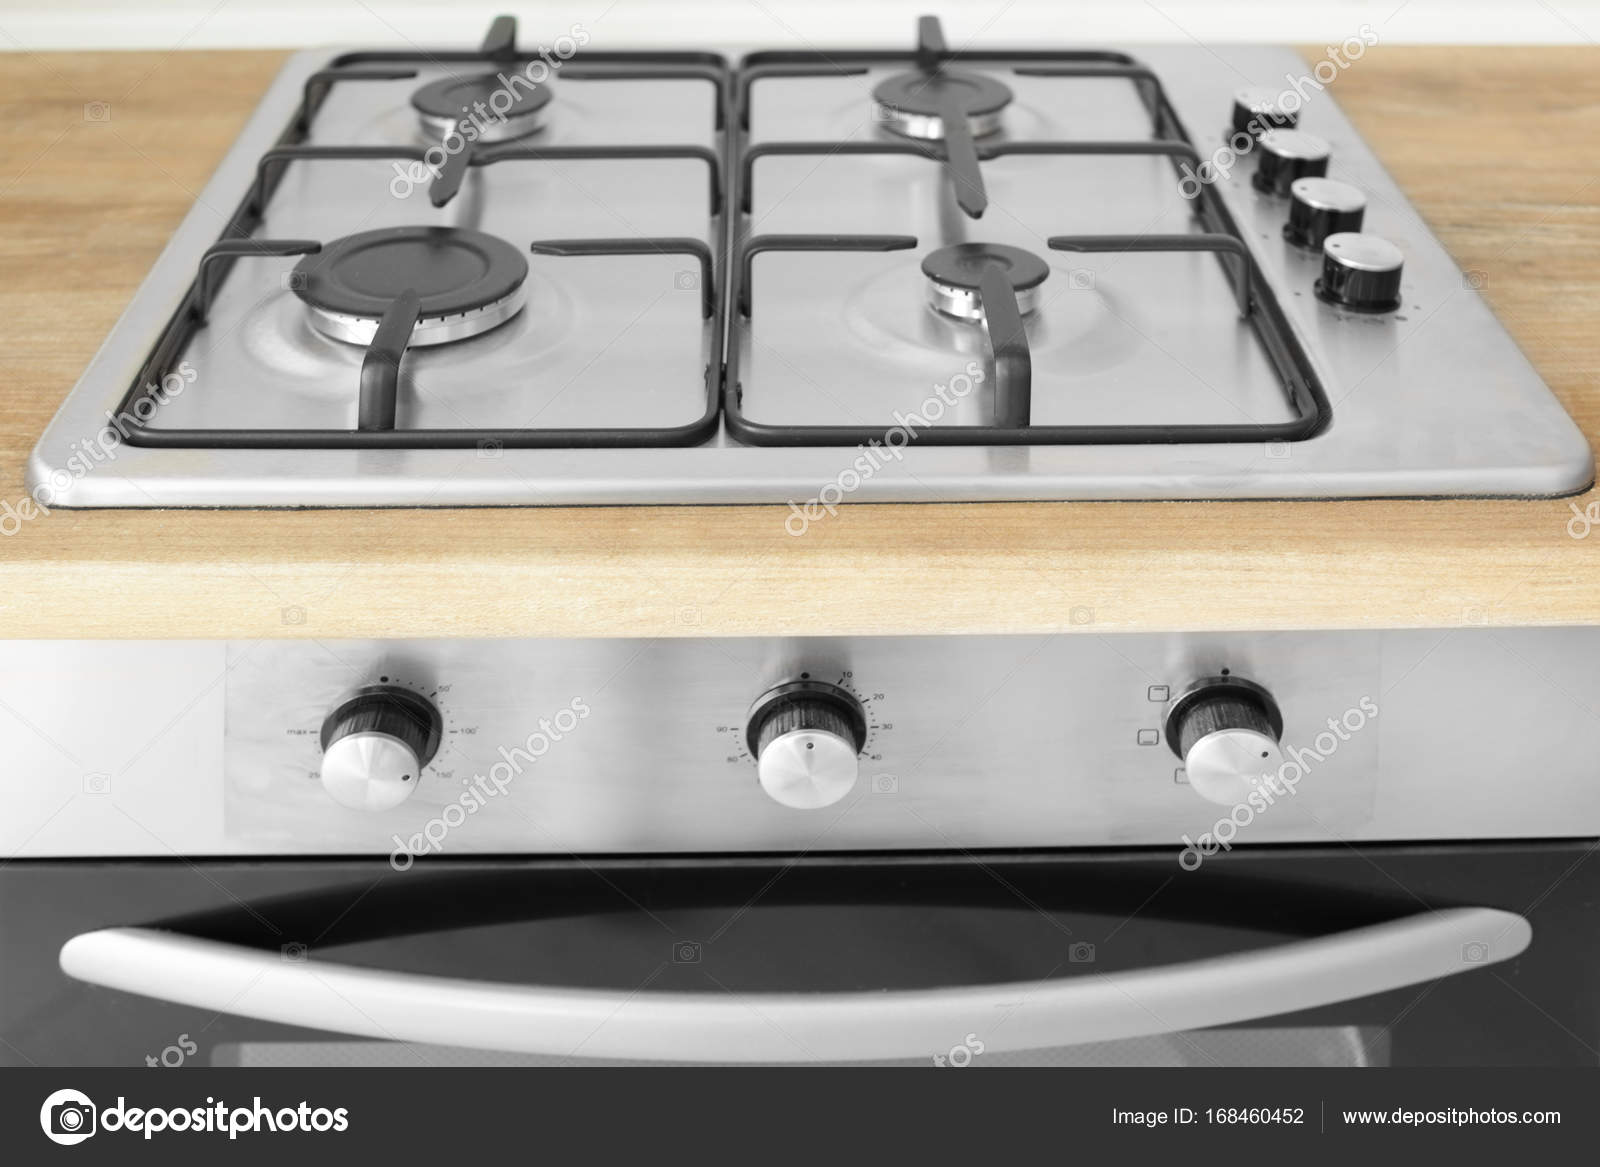 Gasherd Küche | Kuche Gasherd Stockfoto C Belchonock 168460452